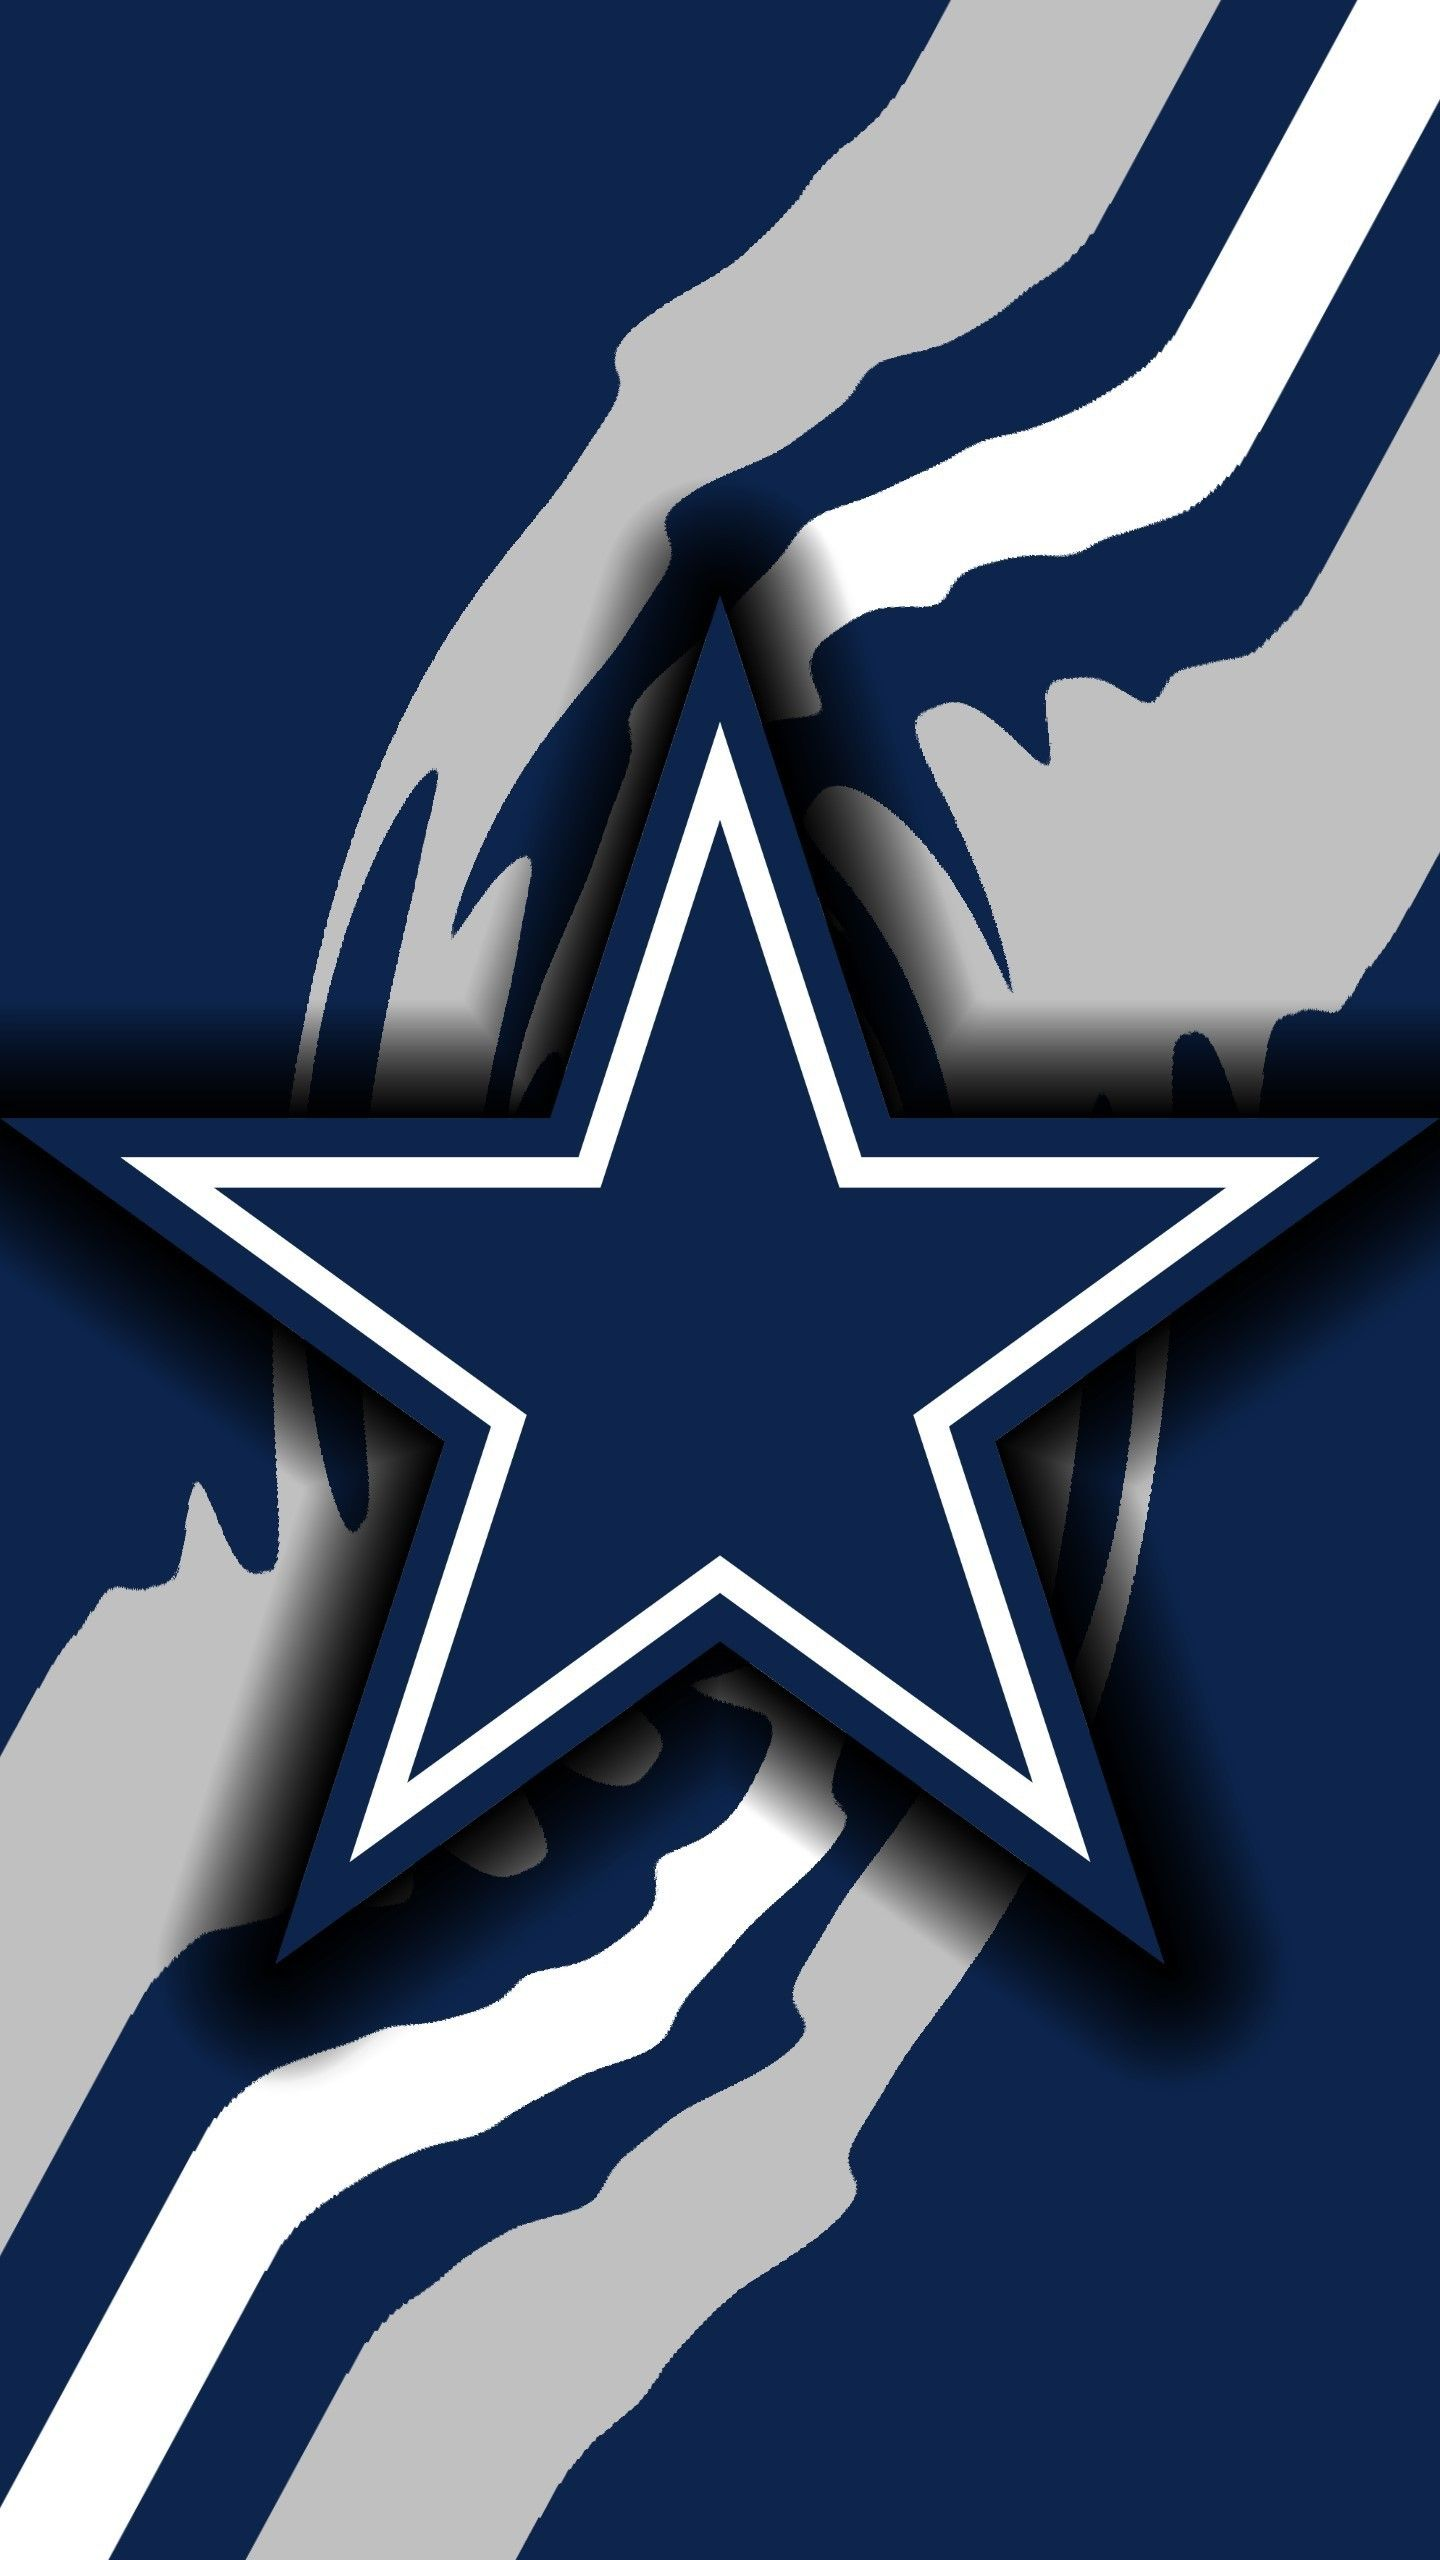 Beautiful Dallas Cowboys Wallpaper Hd iPhone en 2020